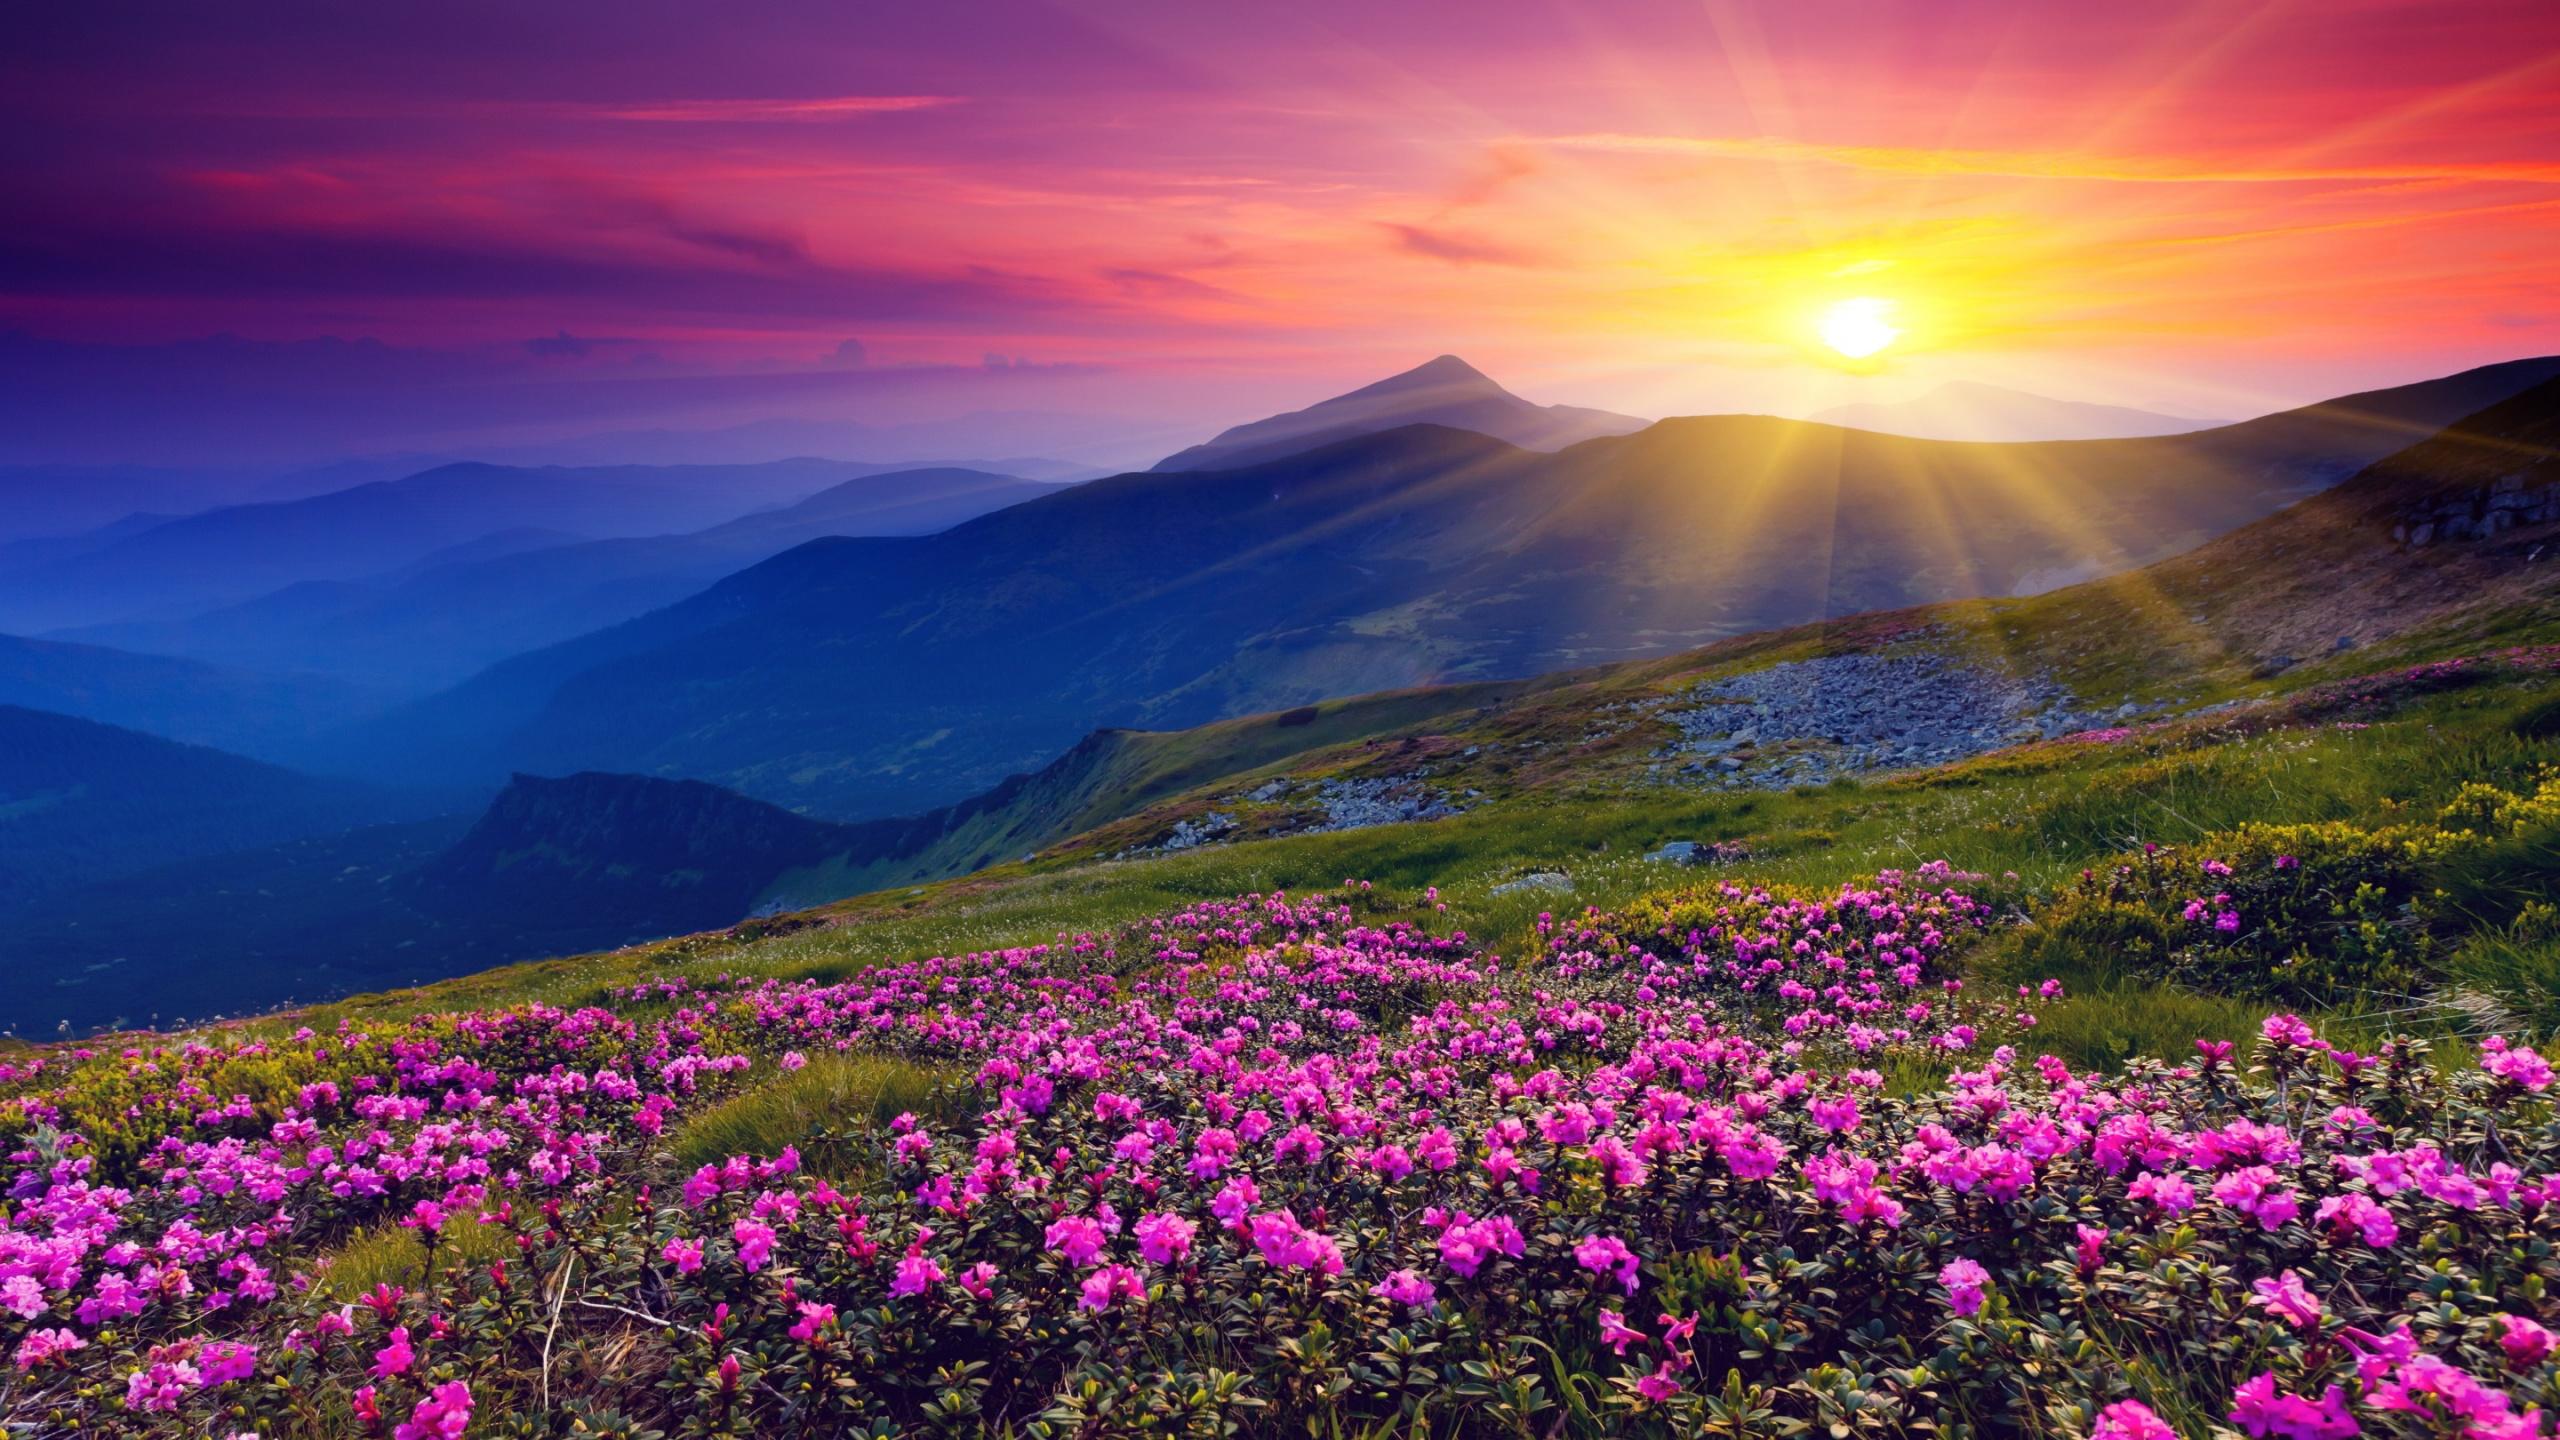 Amazing Wallpaper Mountain Flower - 680092  Collection_988176.jpg